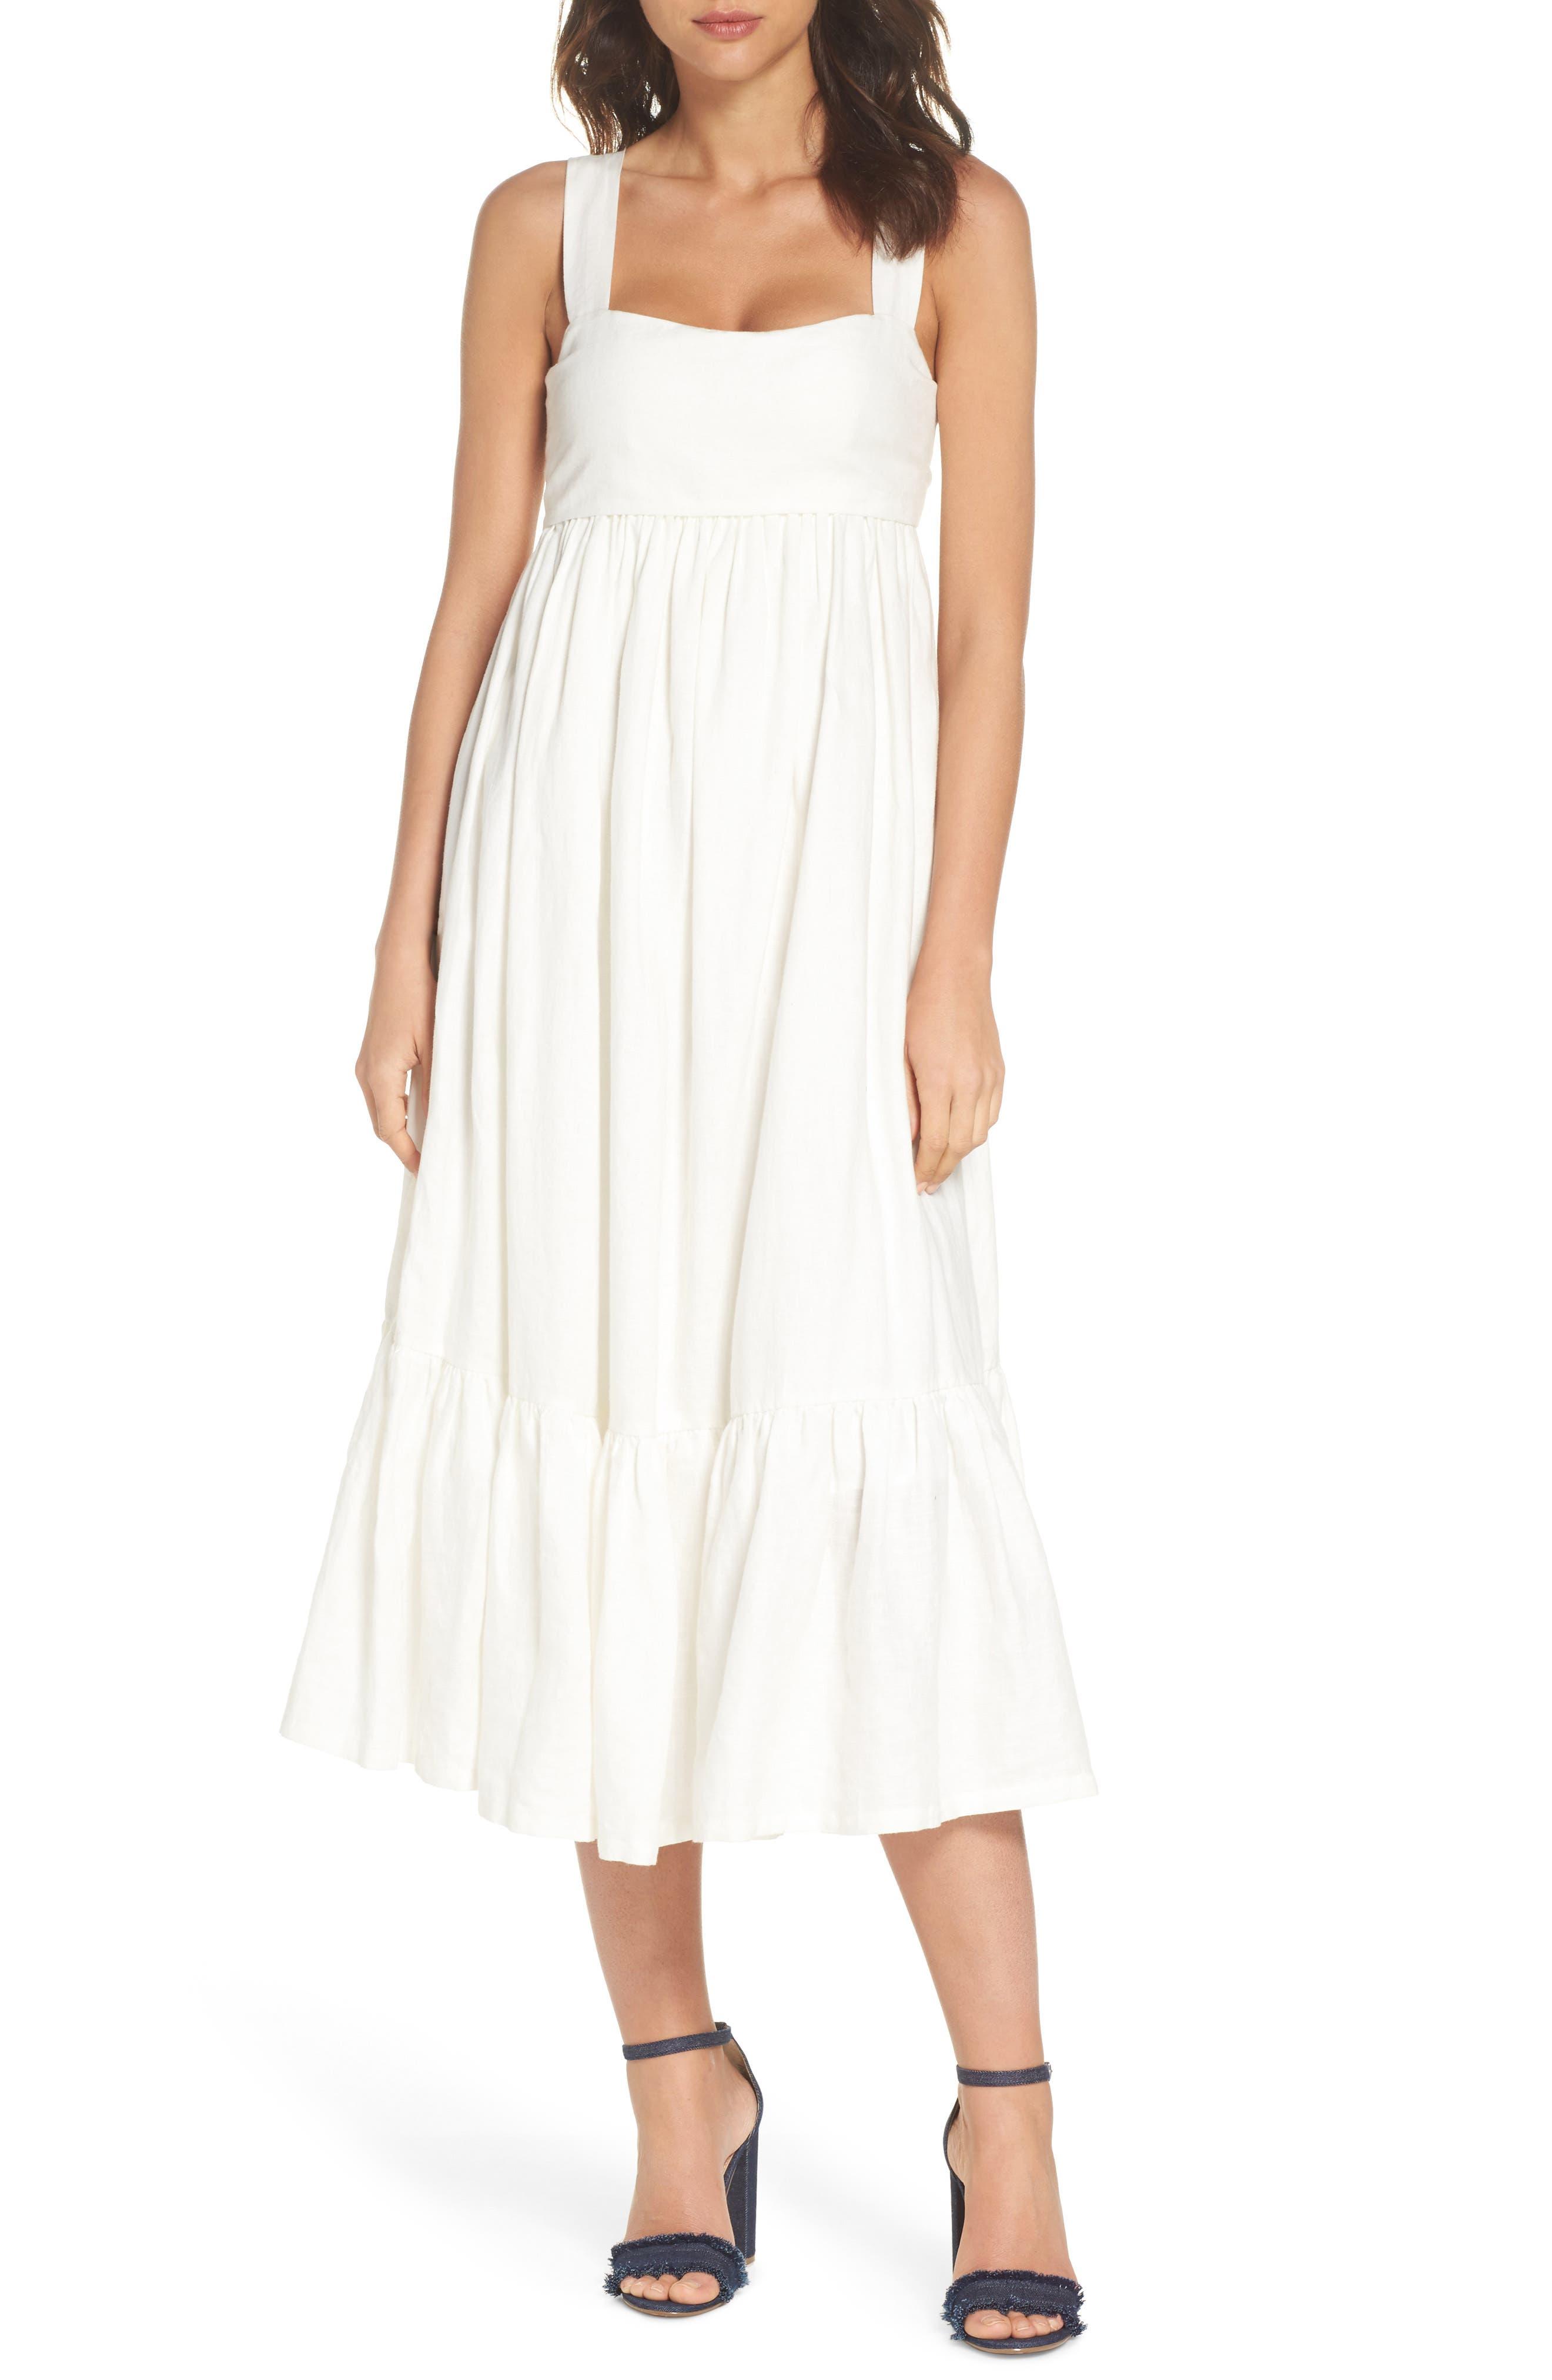 Caara Forget Me Not Midi Dress, White